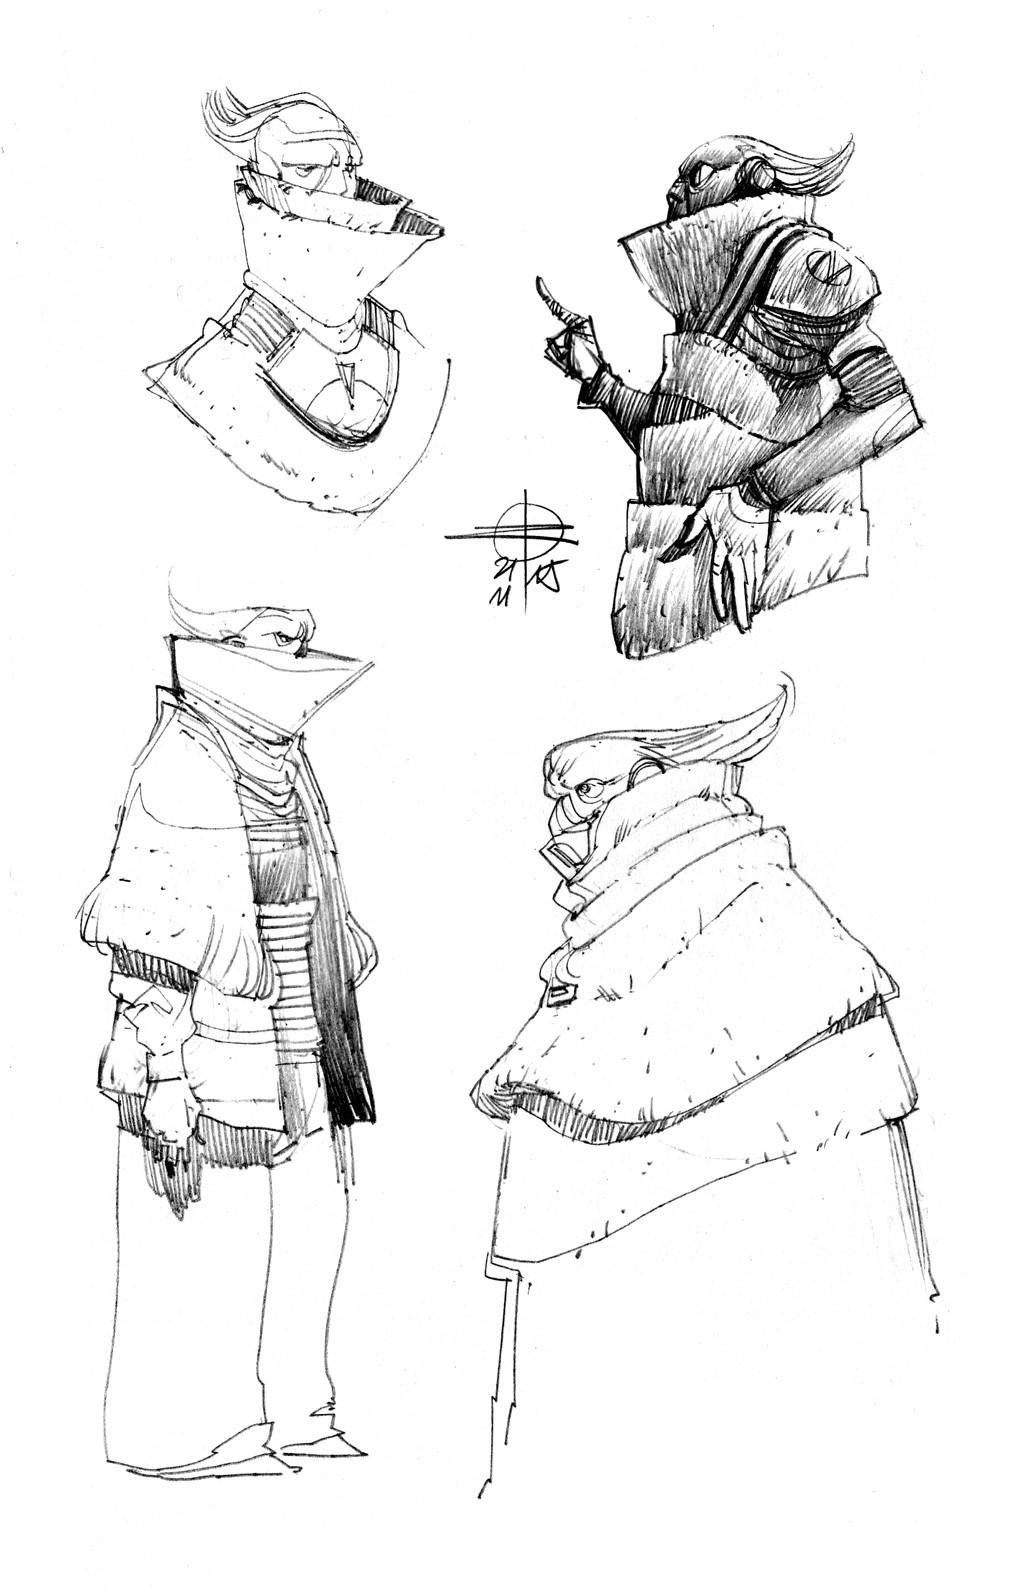 Renaud roche valerian sketches03web